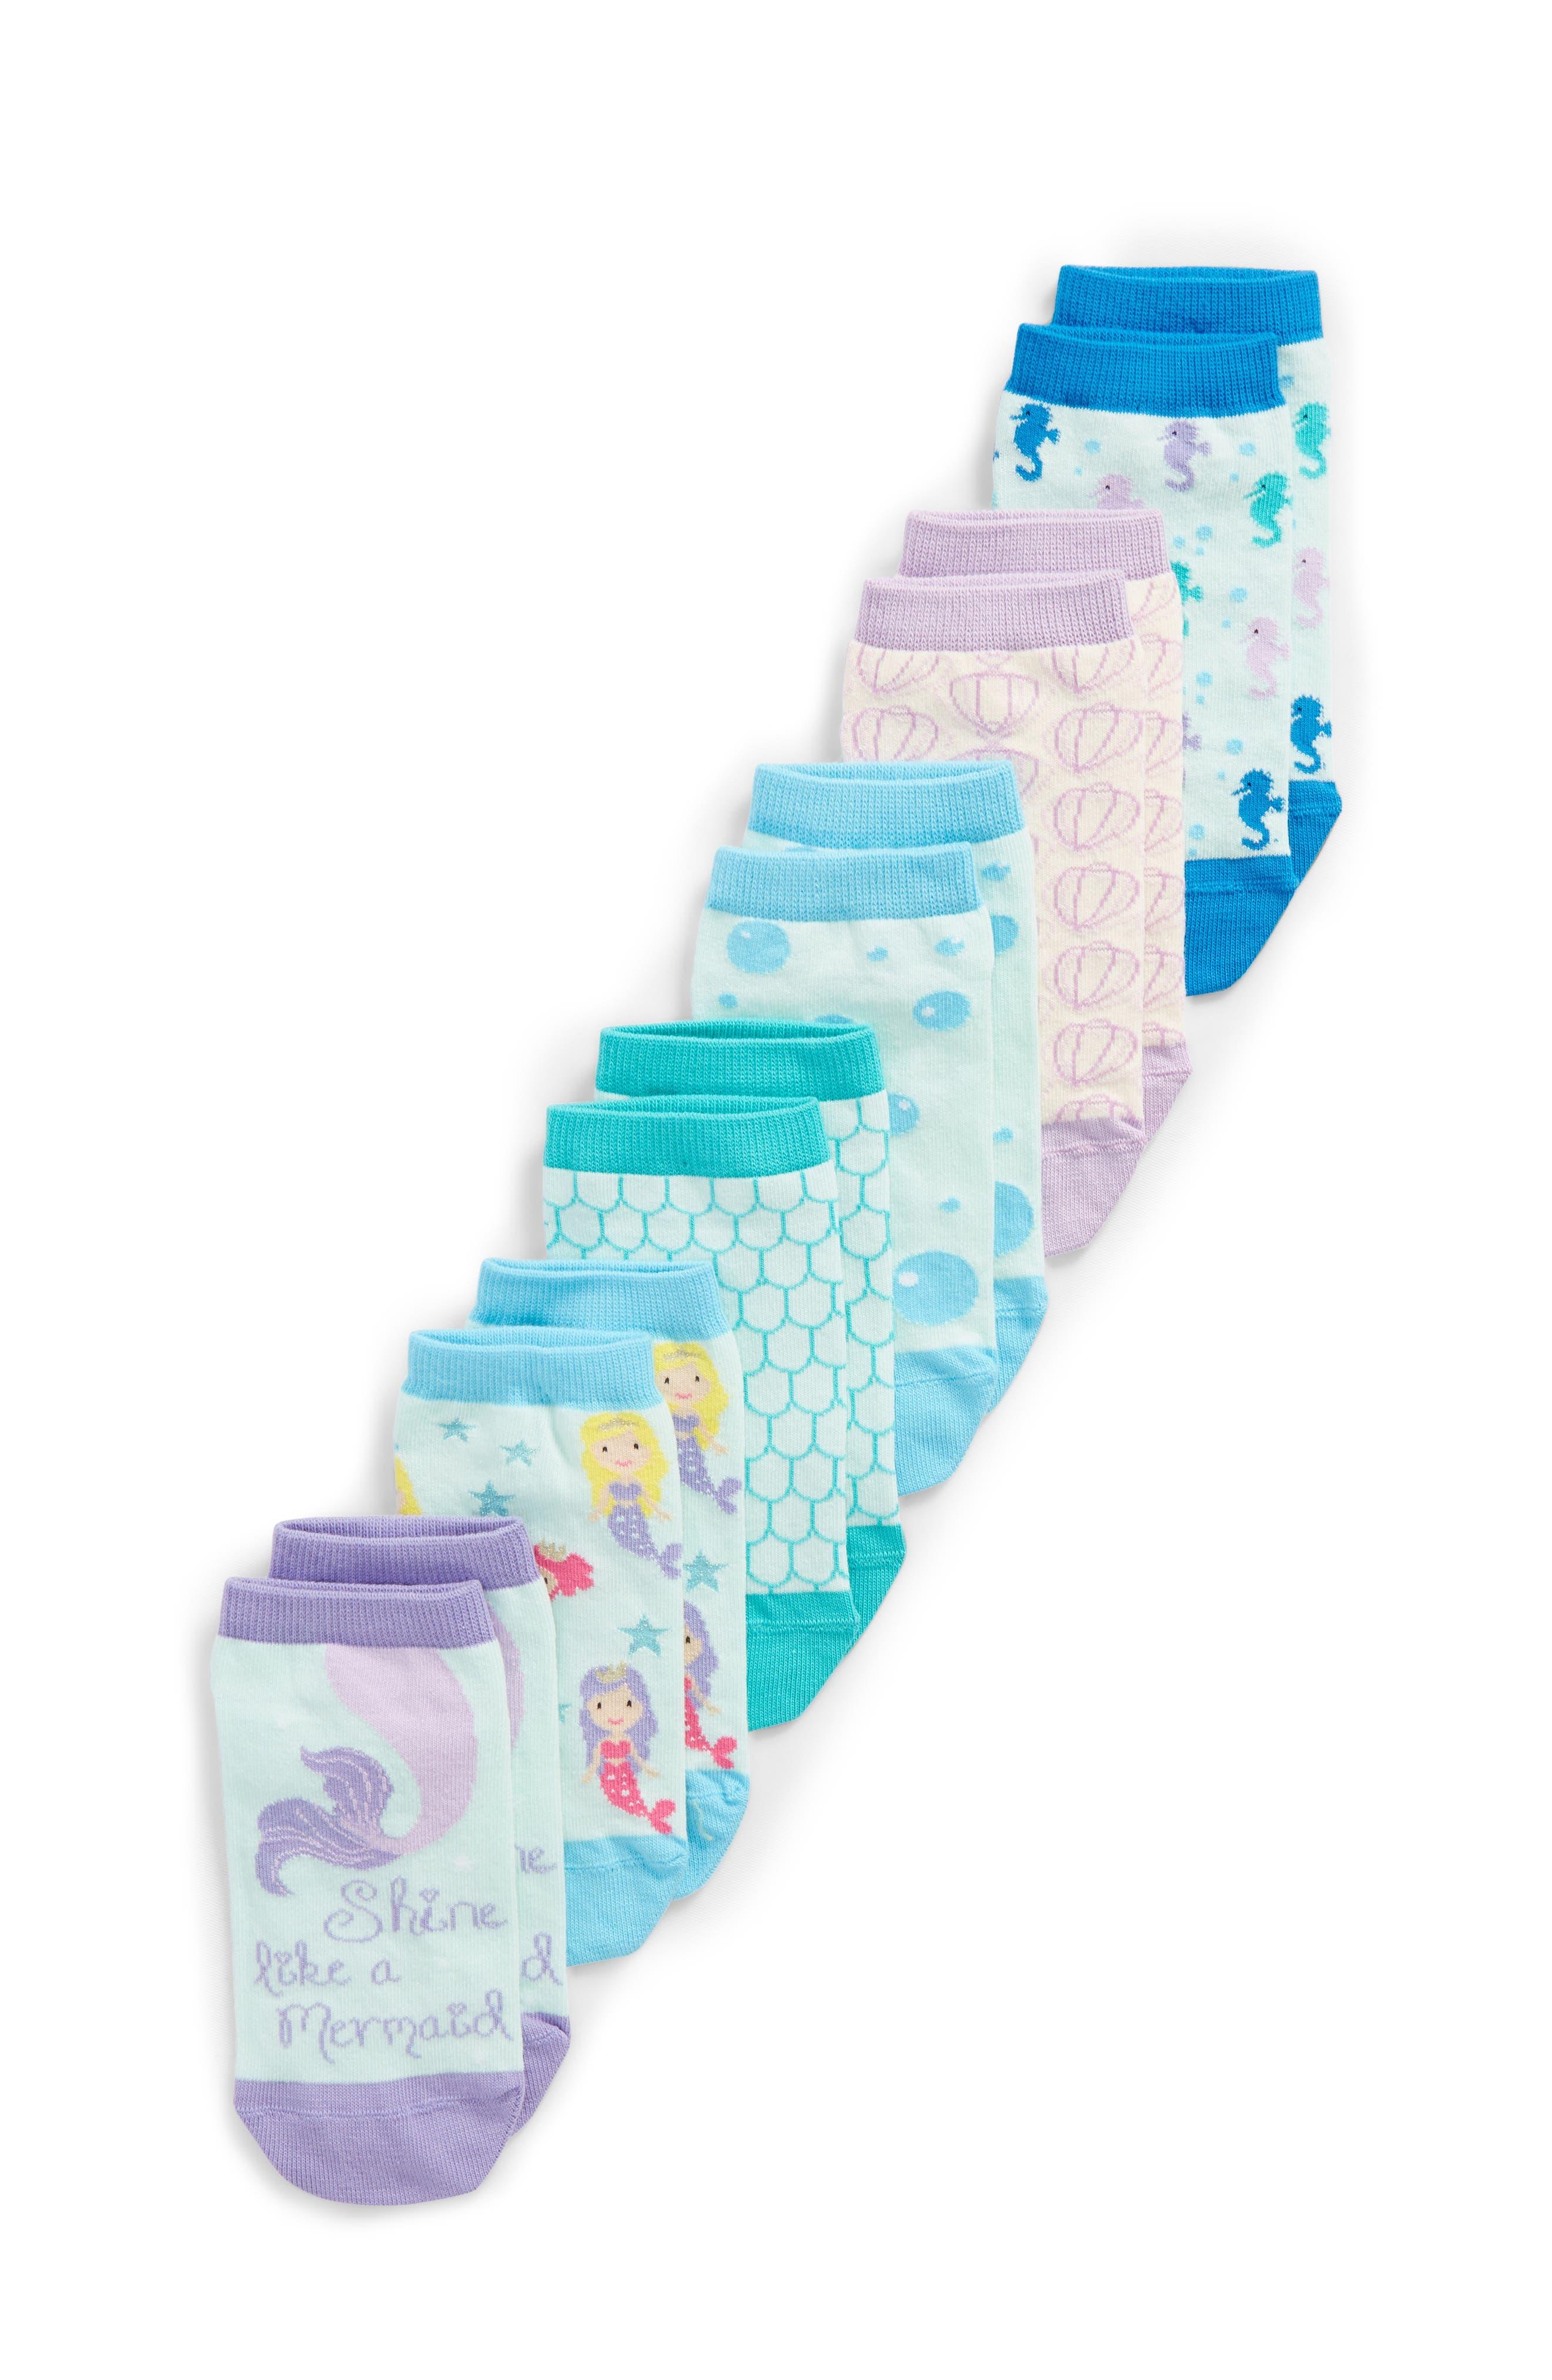 6-Pack Mermaid Low Cut Socks,                             Main thumbnail 1, color,                             404